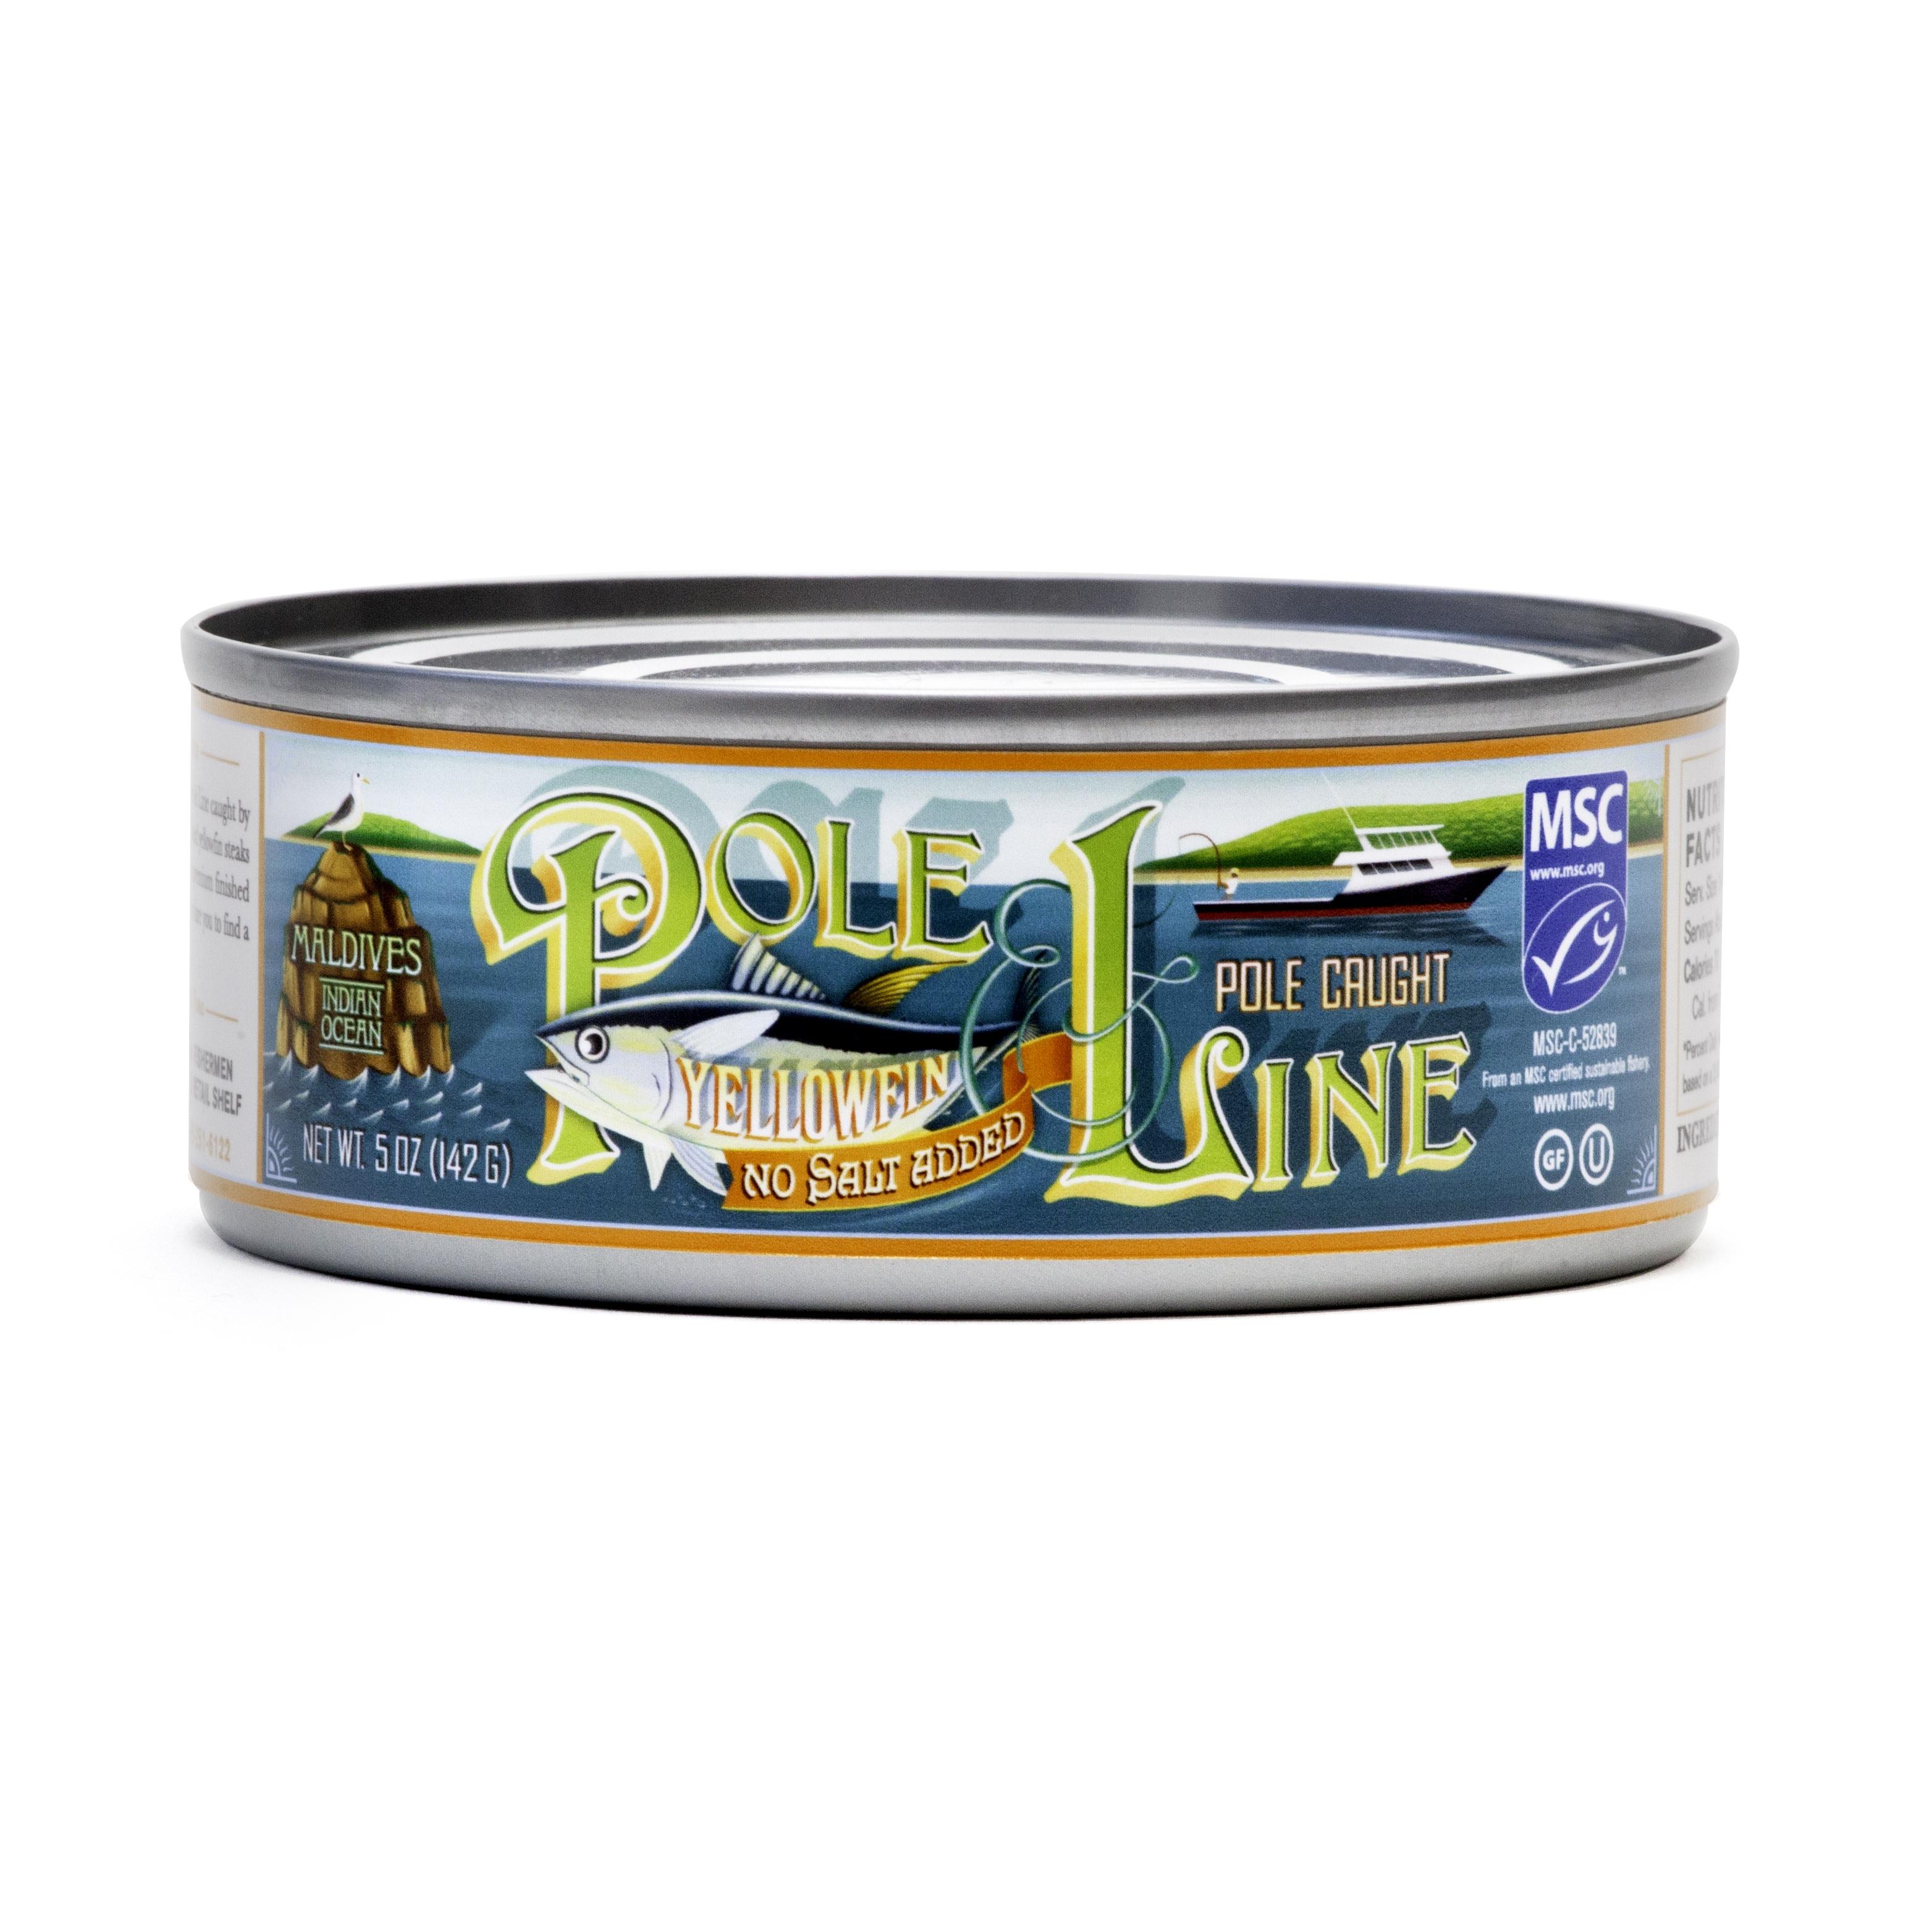 Pole & Line Tuna